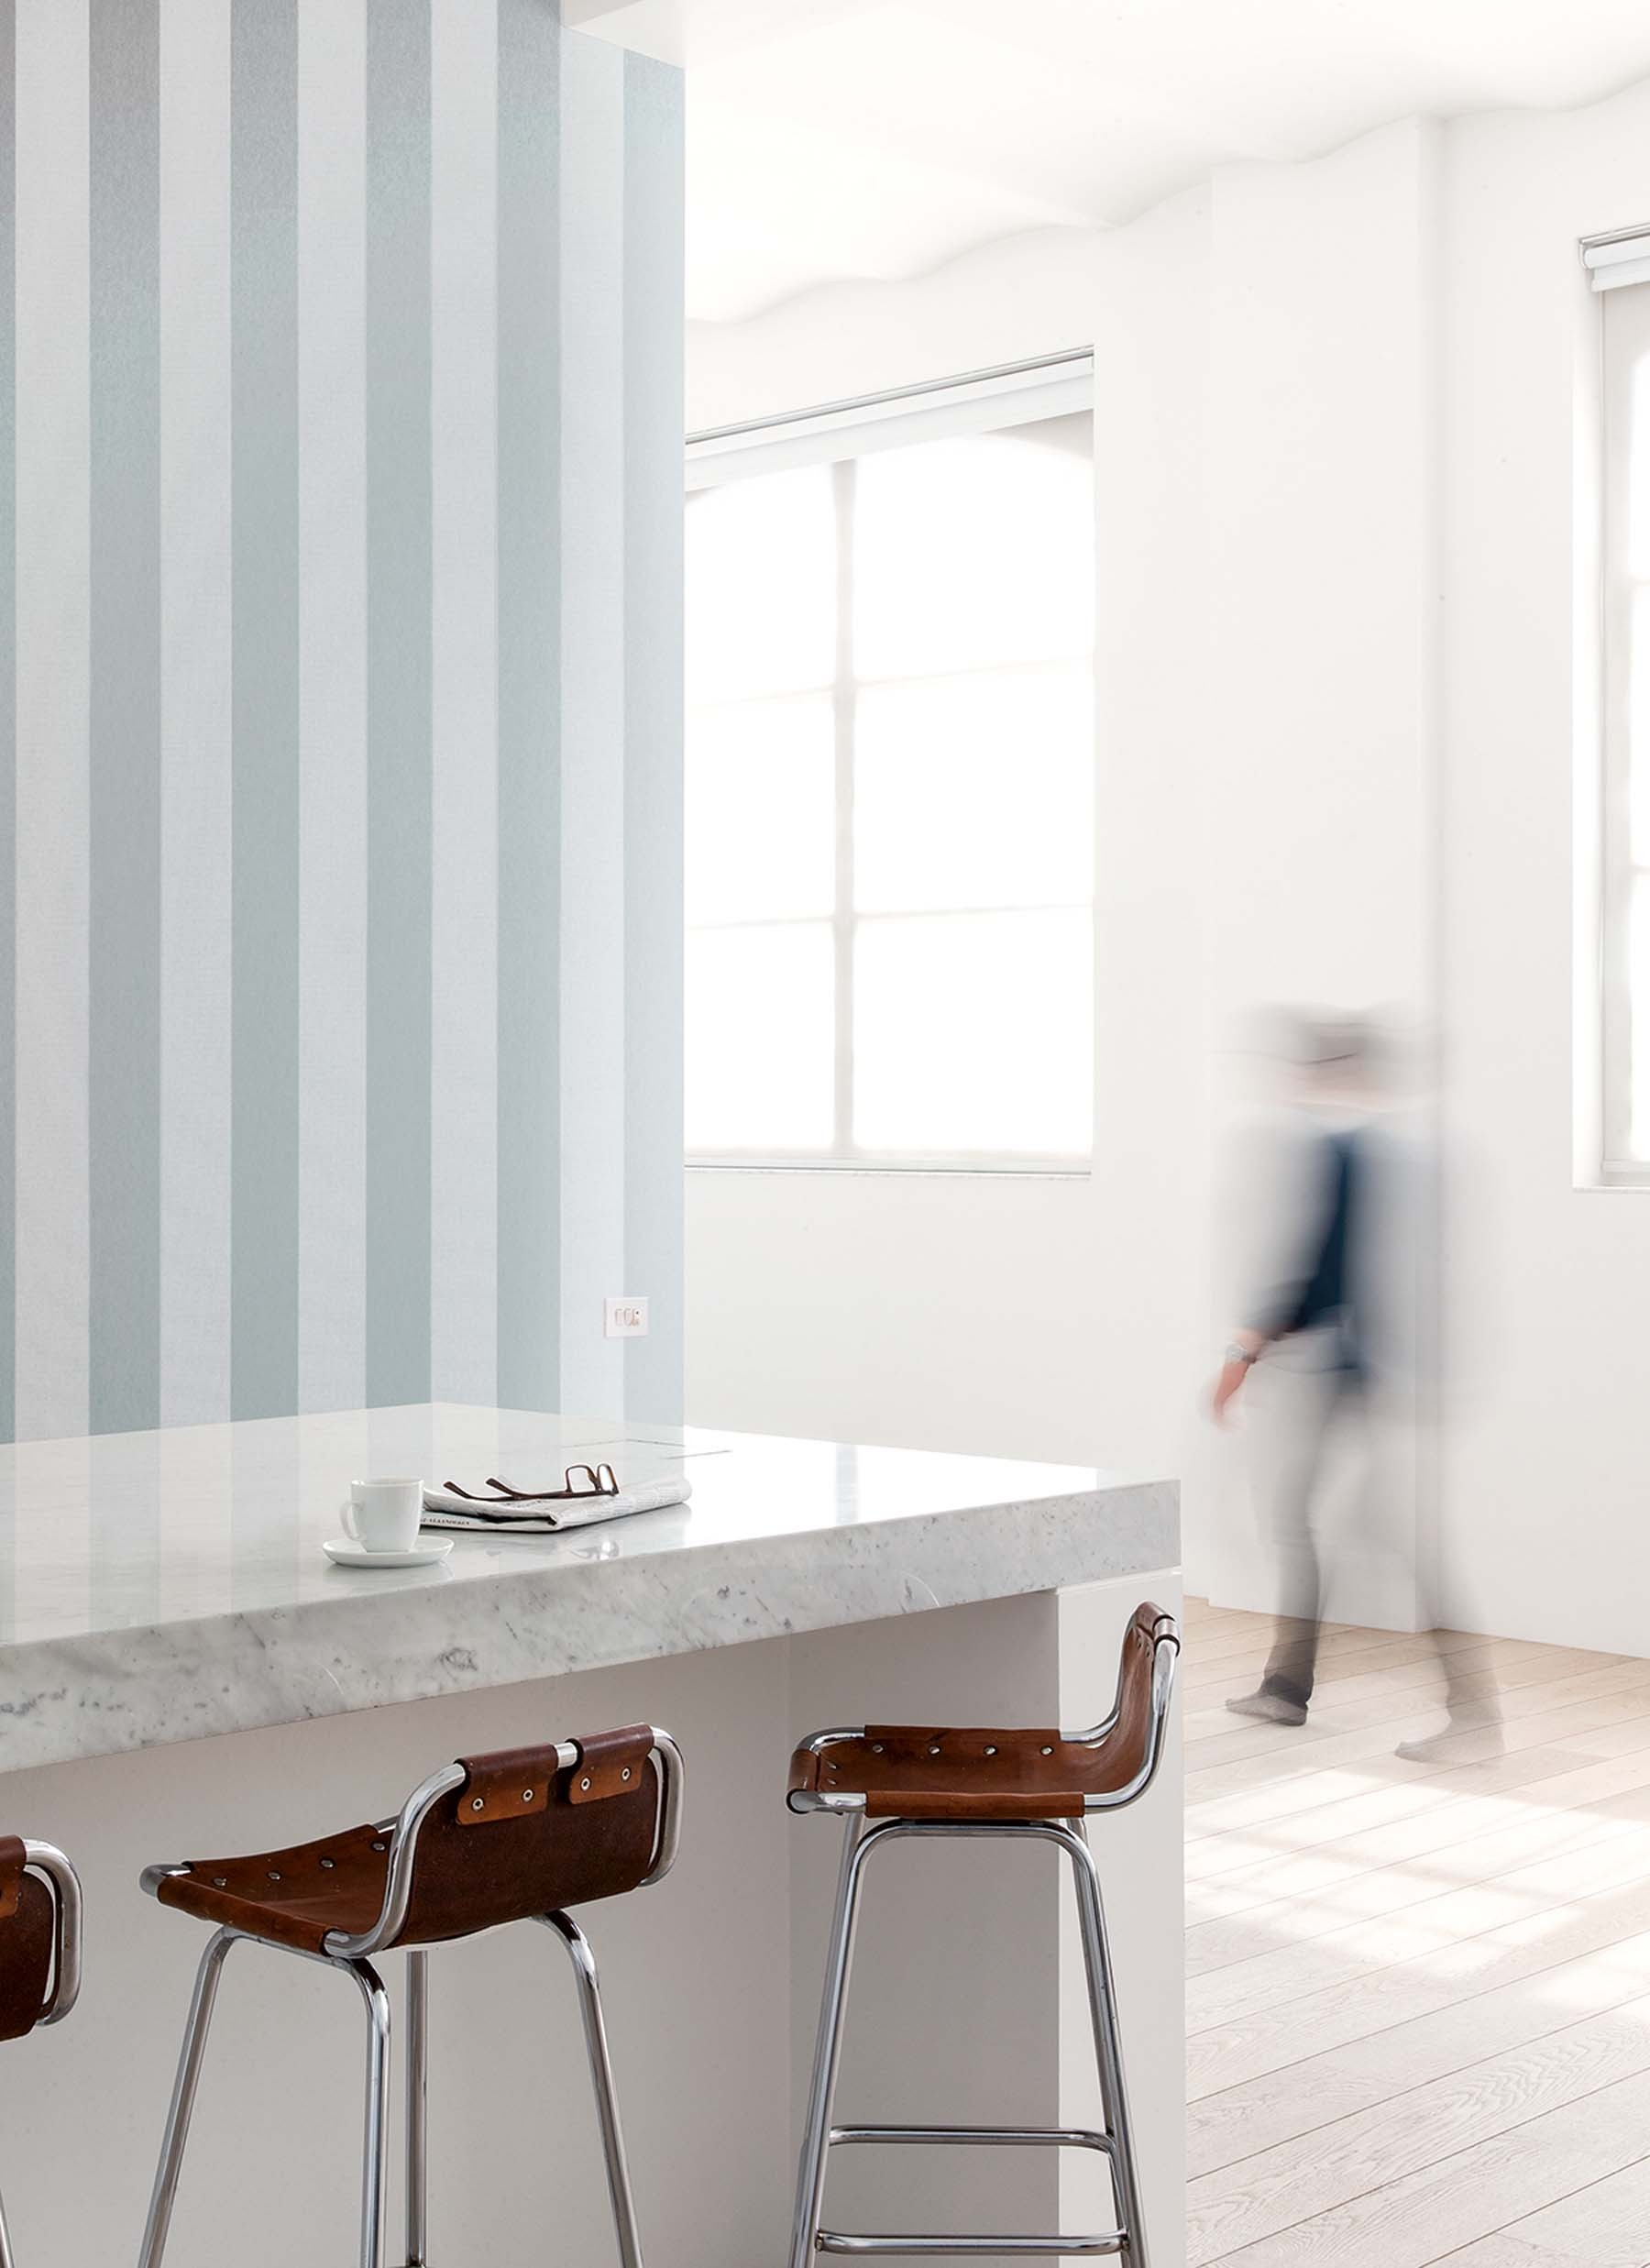 lina tapeten khroma gratisversand rechnungskauf. Black Bedroom Furniture Sets. Home Design Ideas